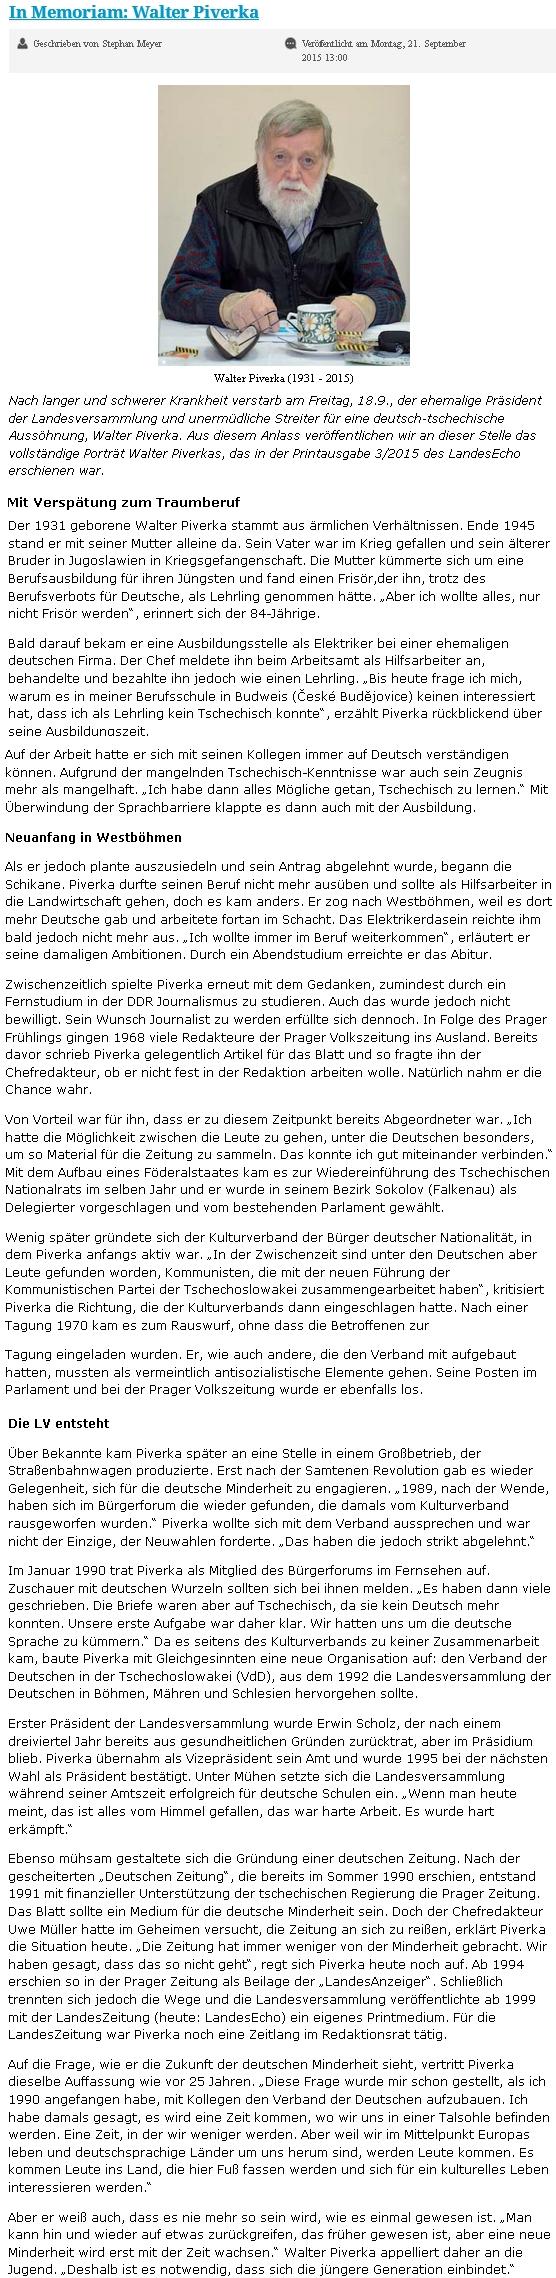 Nekrolog v německém pražském listu napsal Stephan Meyer